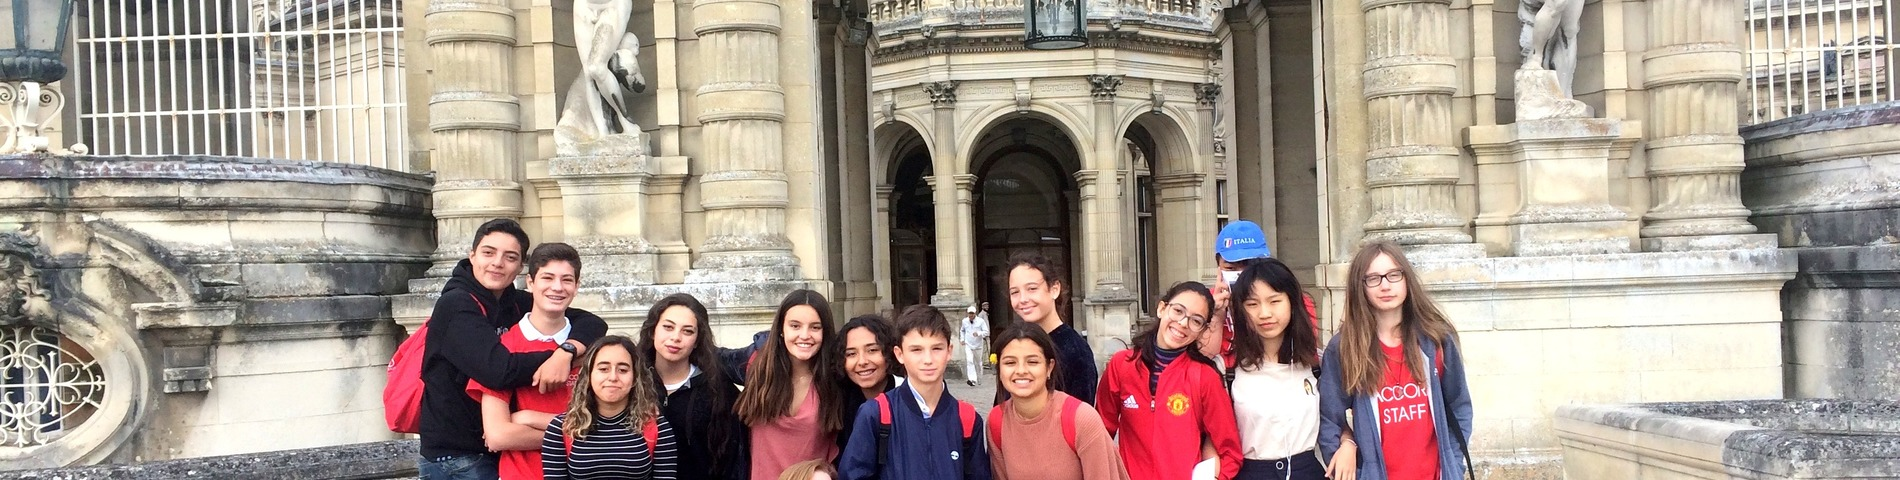 Accord French Language School photo 1